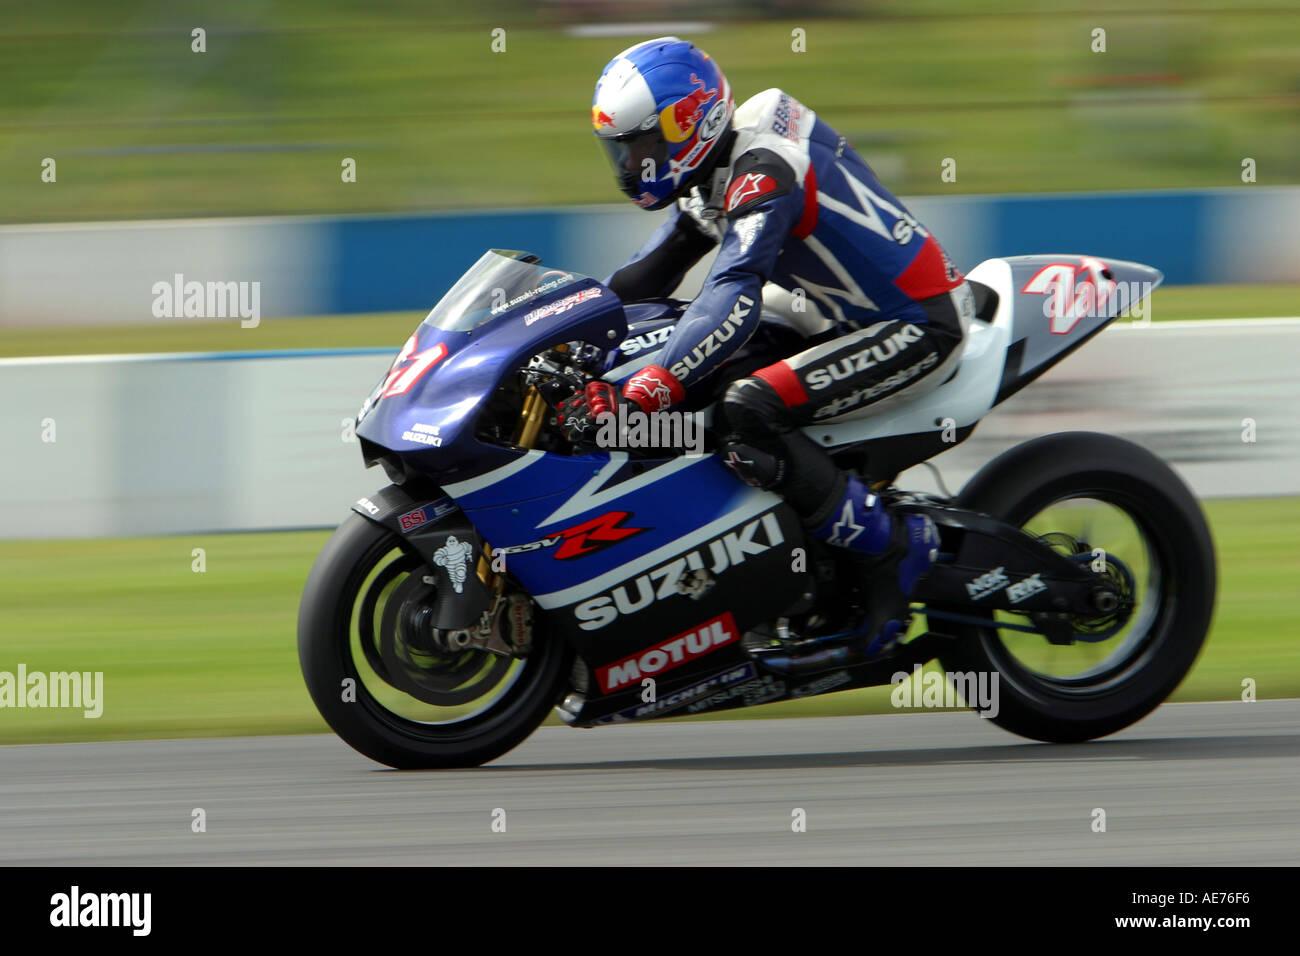 John Hopkins Suzuki rsv1000 hard on the brakes at Speed in 2003 Stock Photo, Royalty Free Image ...